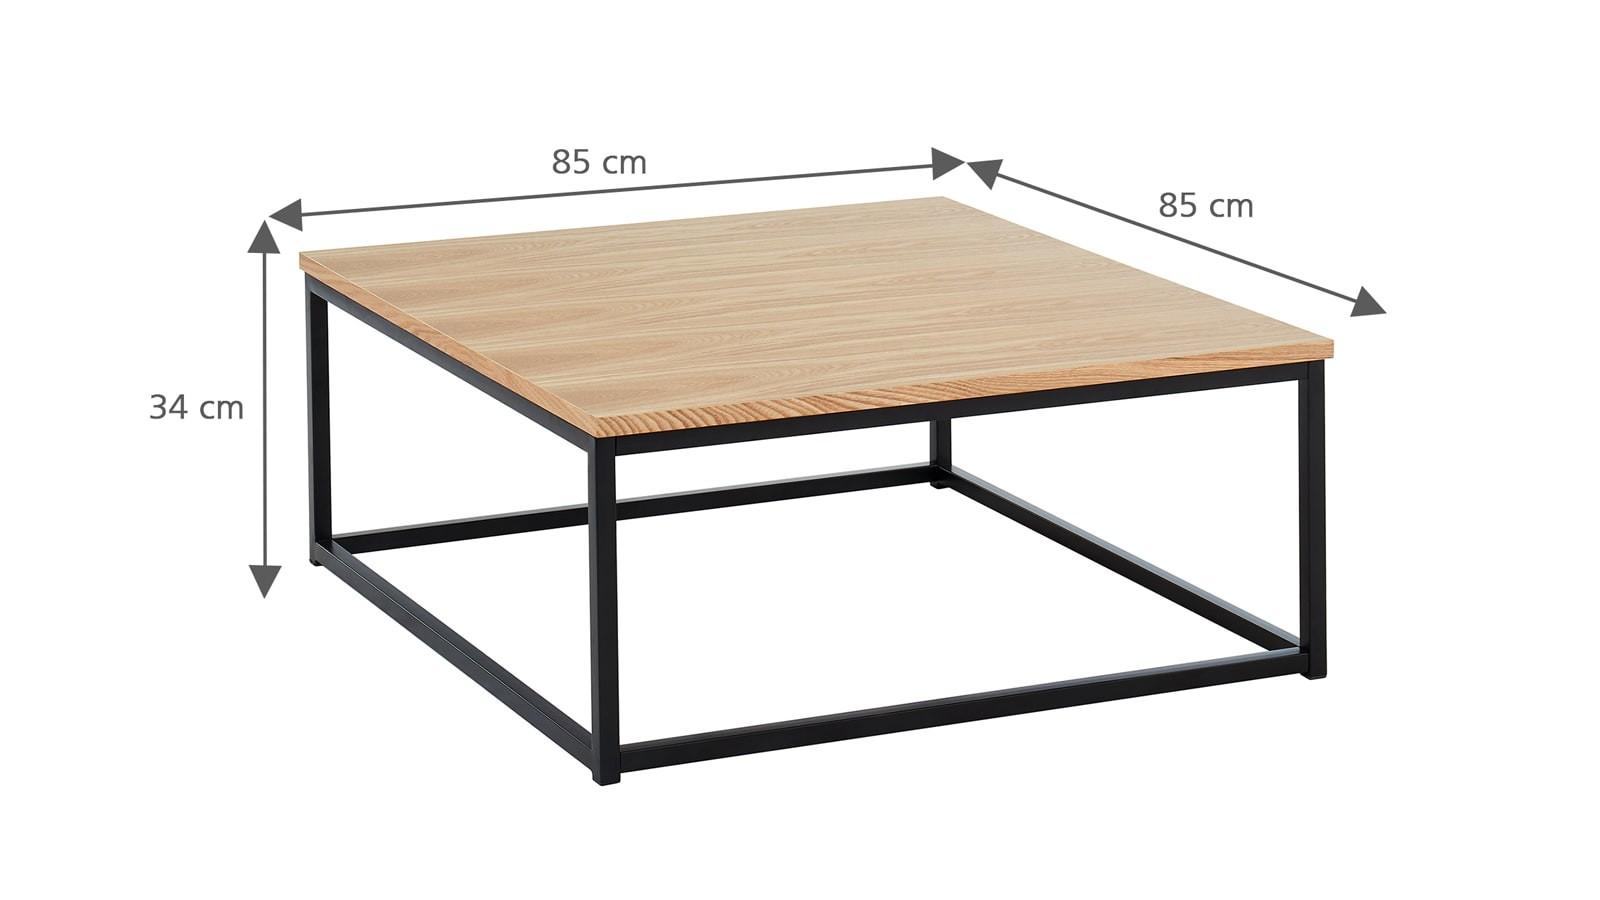 dimensions table Brixton